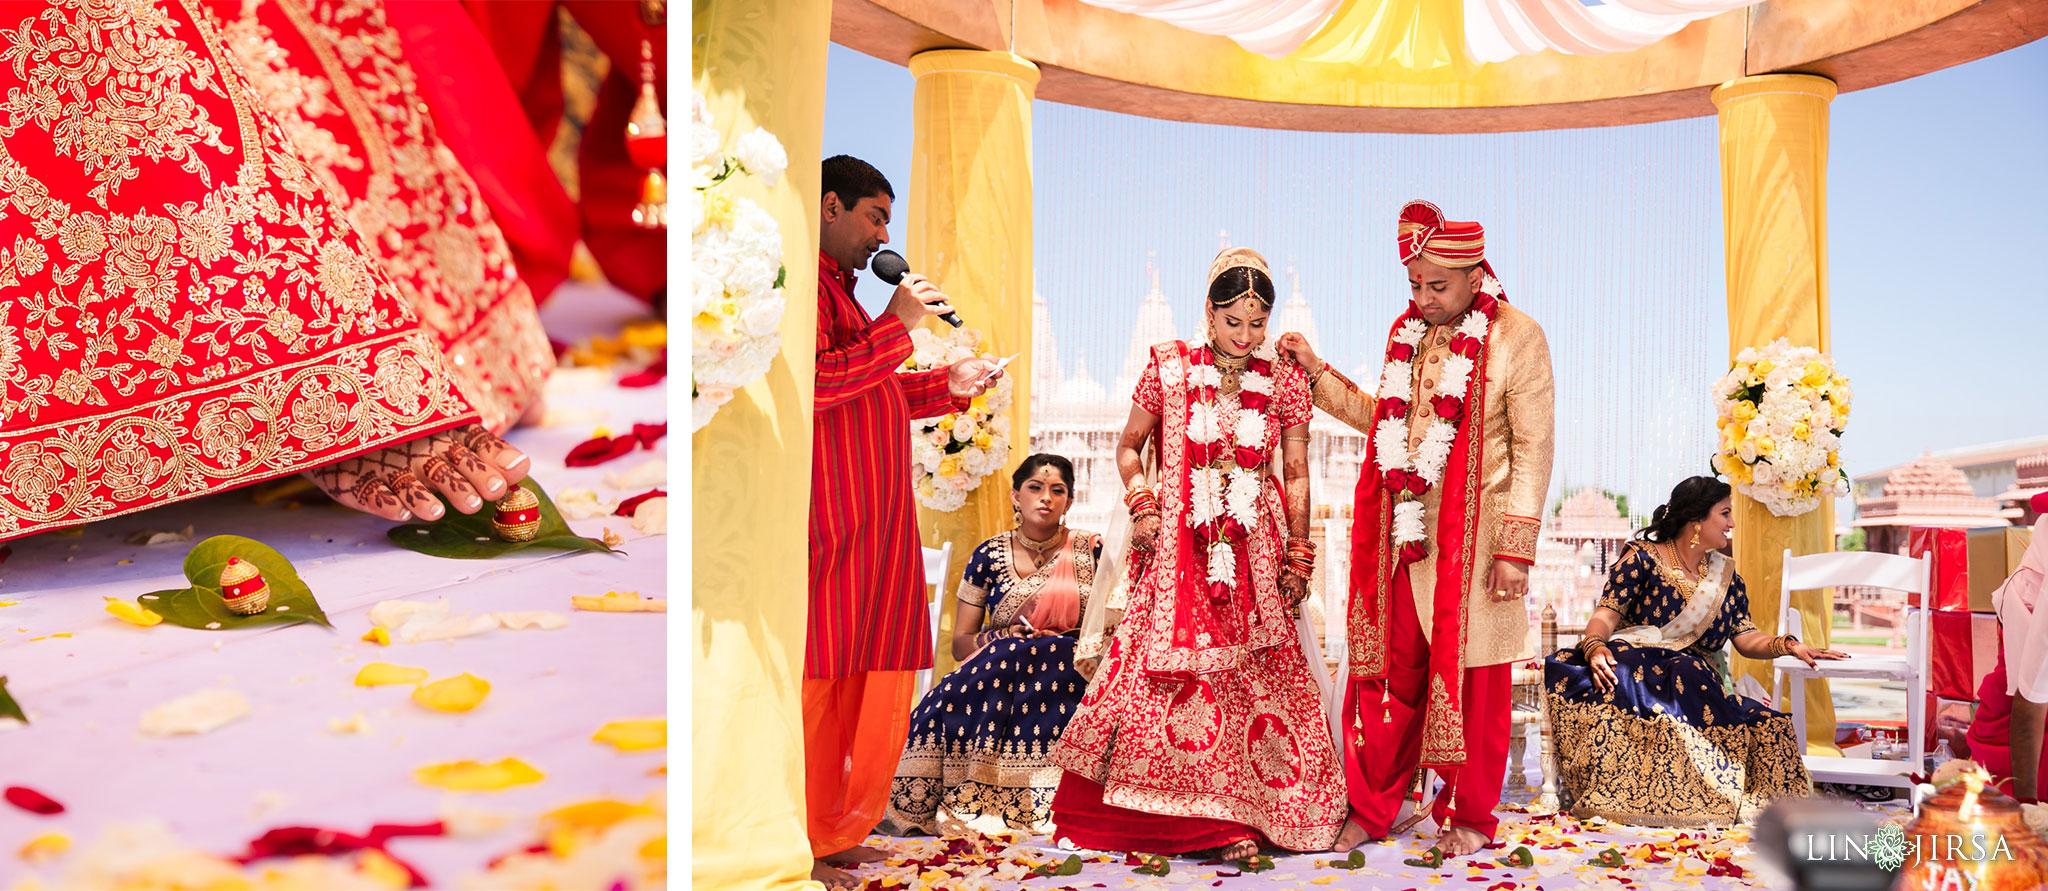 090 BAPS Swaminarayan Sanstha Chino Hills Indian Wedding Photography